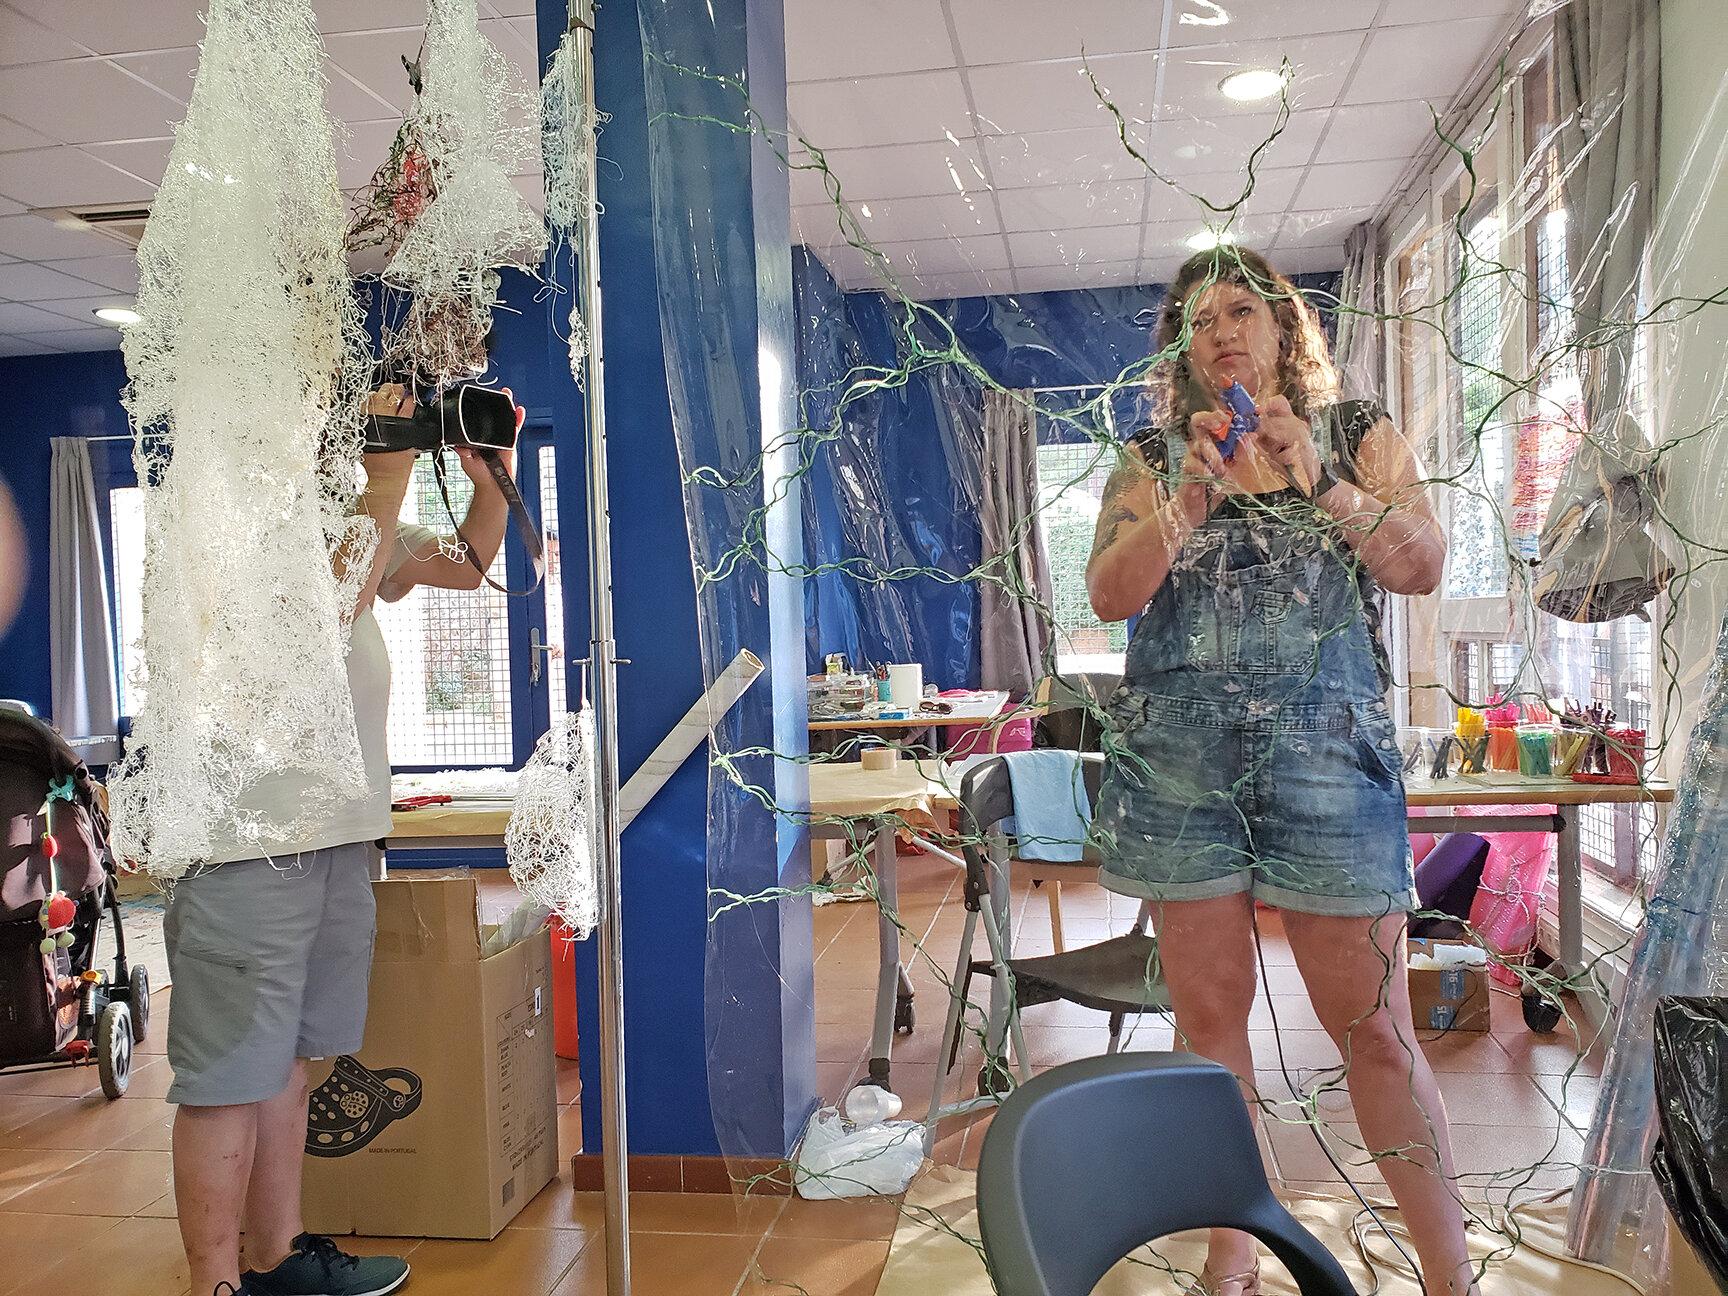 AIR.CAT 2019 resident Avital Yomdin working on her installation at the program's Espai Colomer studio.